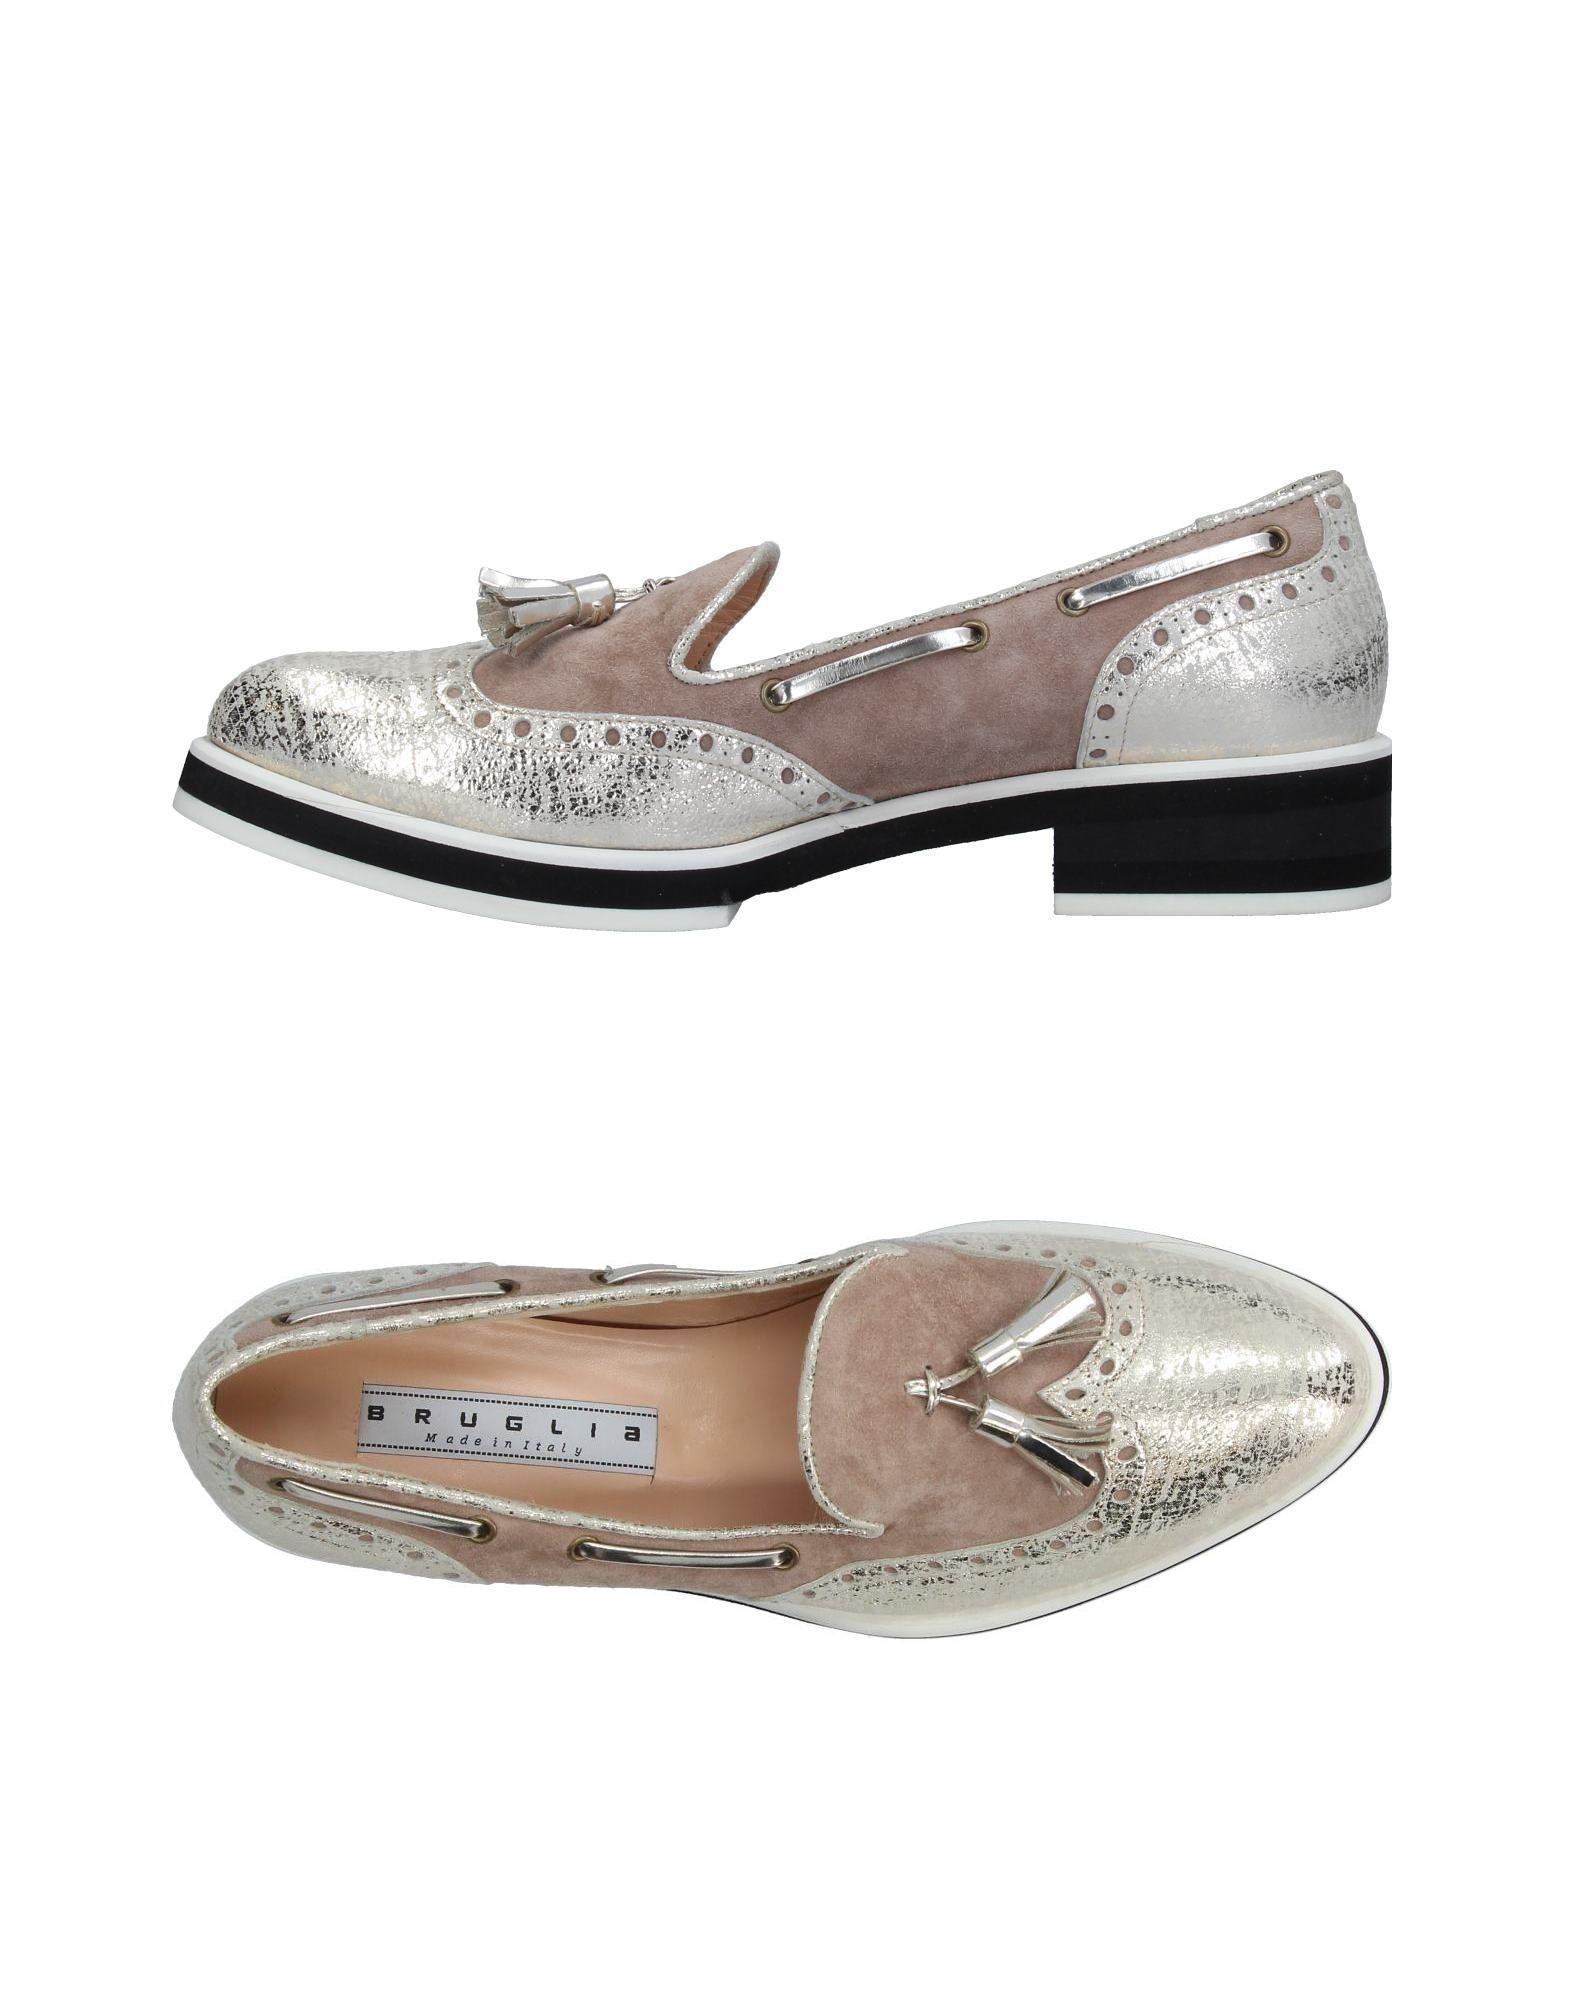 F.Lli Bruglia Mokassins Damen  11345319JA Gute Qualität beliebte Schuhe